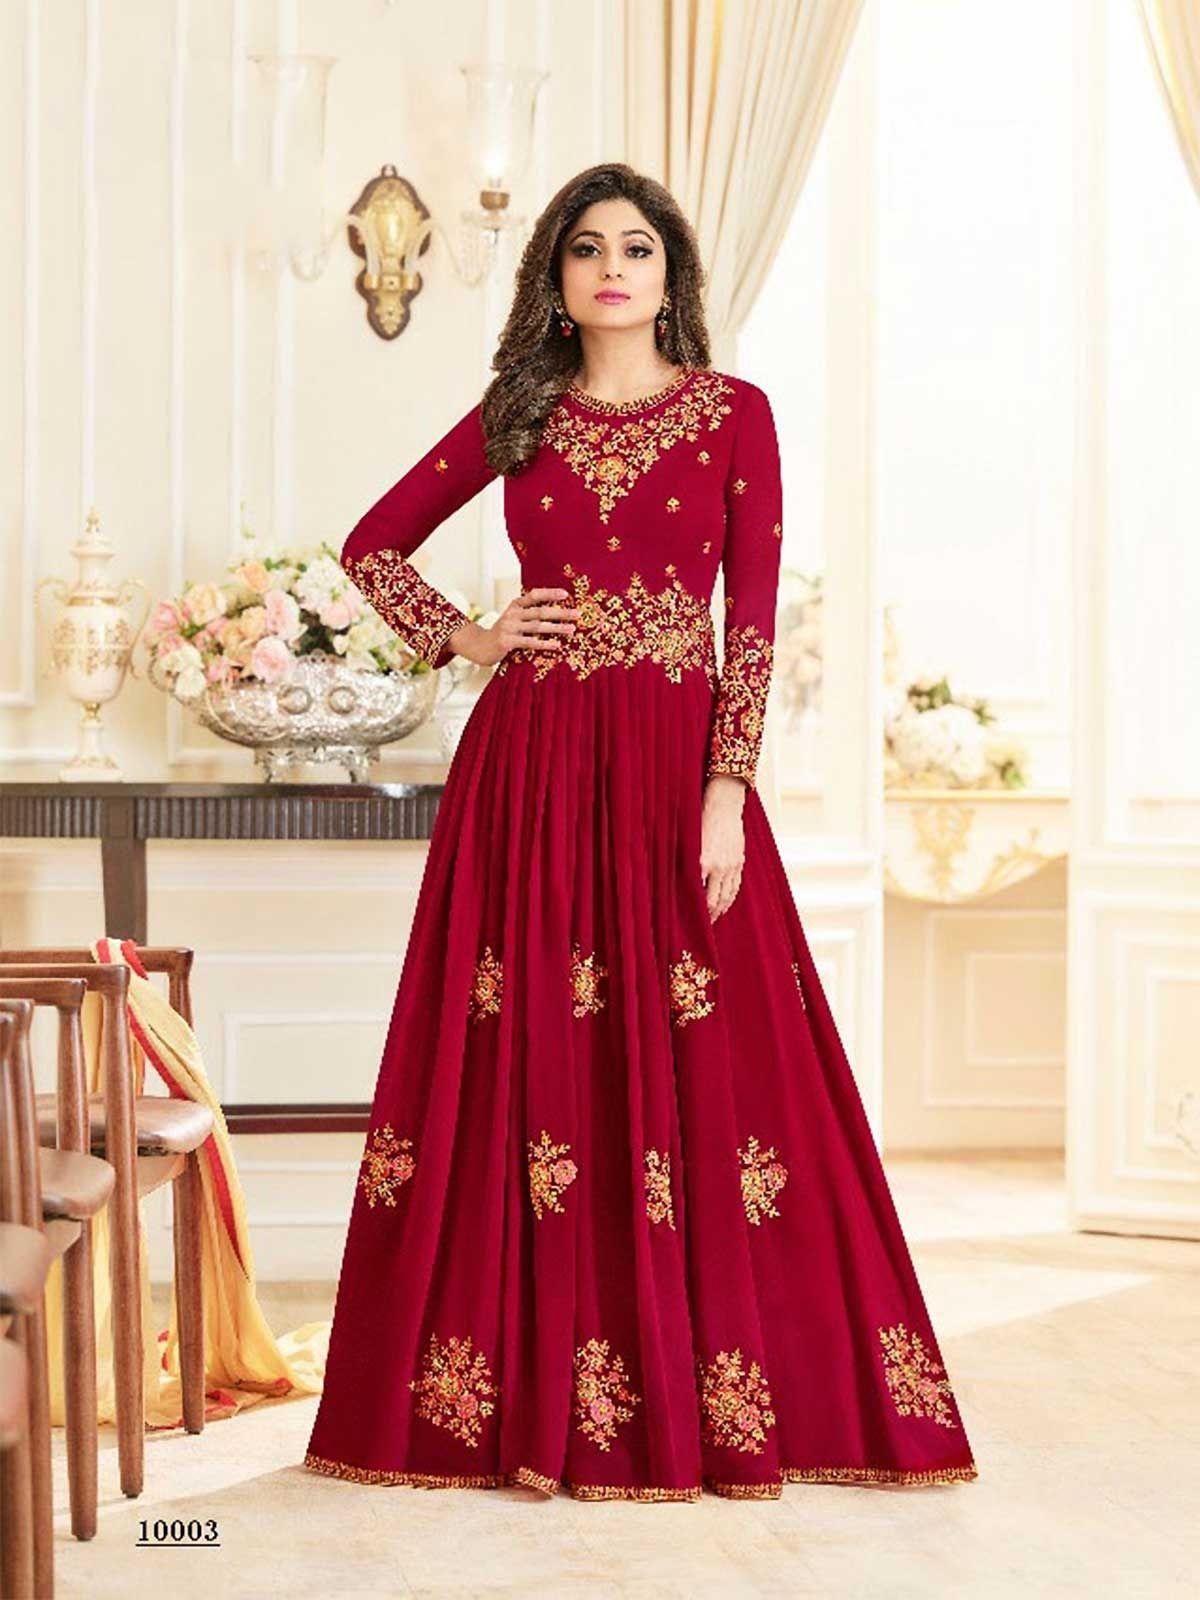 b00d51c317 Buy online beautiful dark red color wedding long style anarkali dress  shopping. Browse our latest designer red anarkali suits and red color anarkali  salwar ...